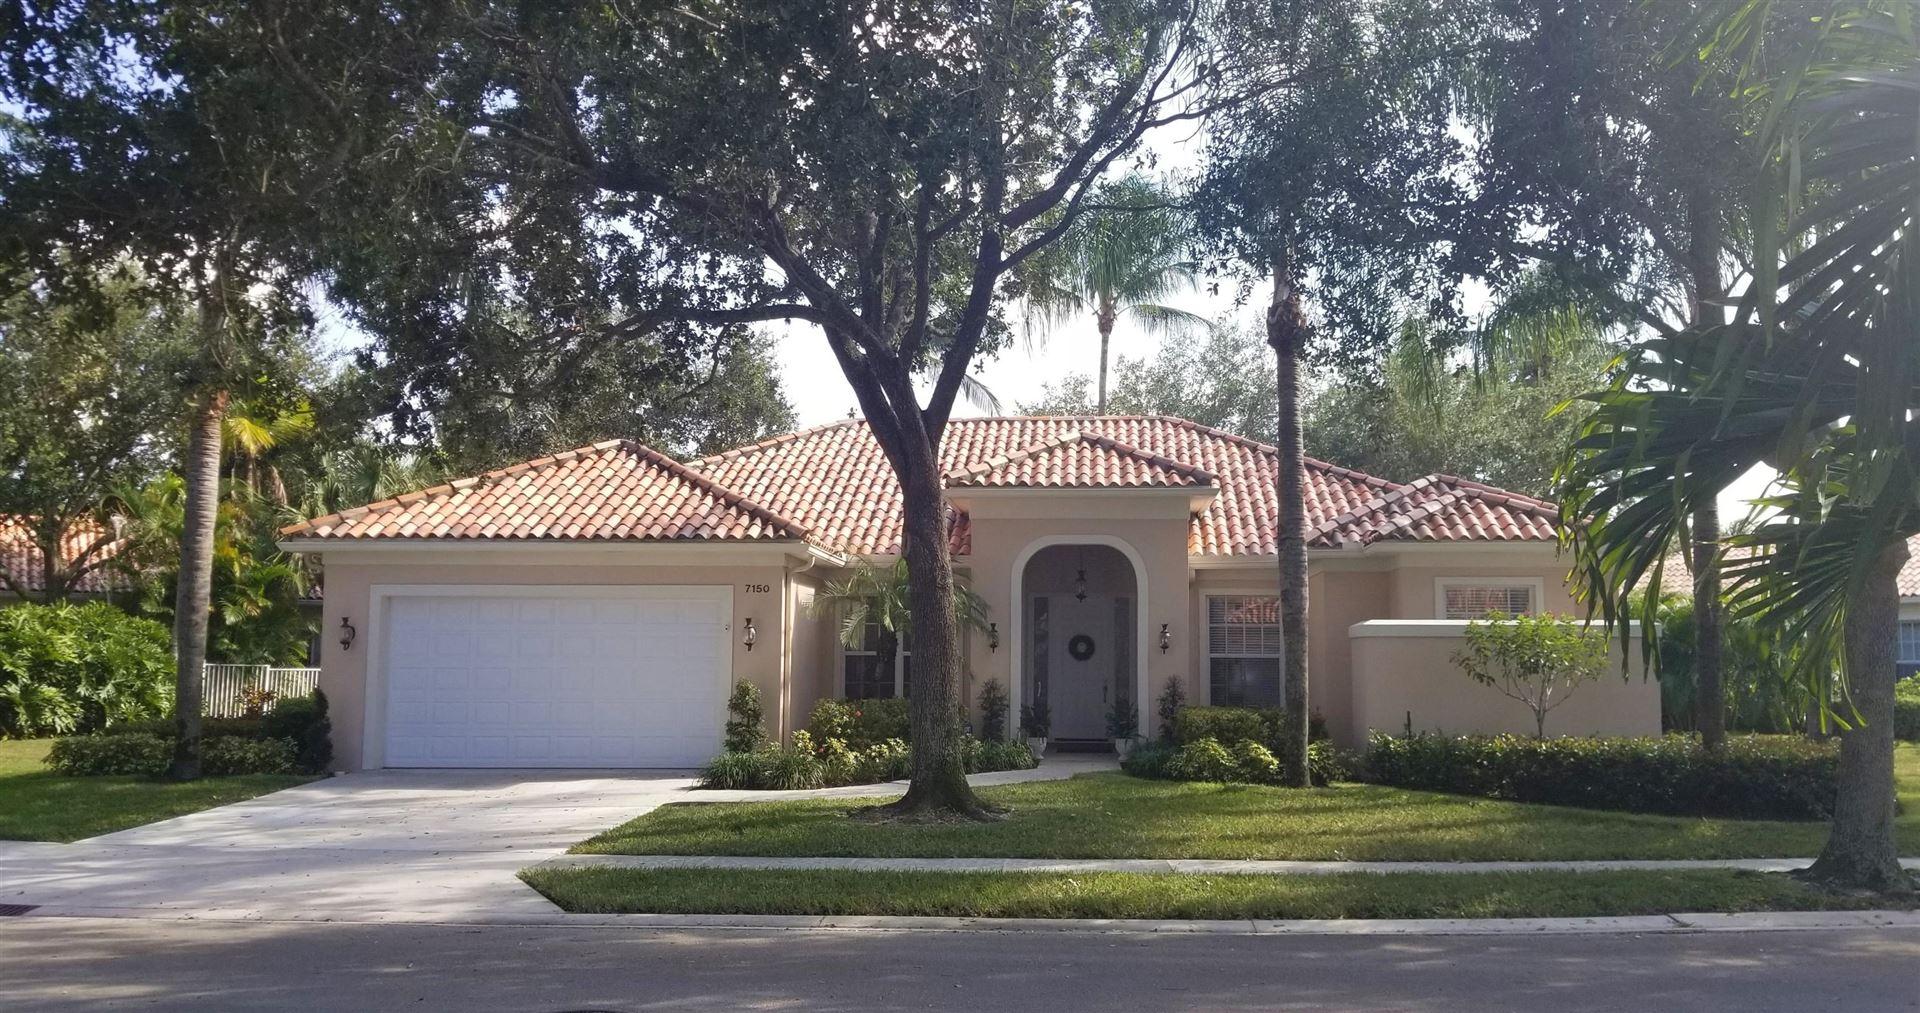 7150 Crystal Lake Drive, West Palm Beach, FL 33411 - #: RX-10660581